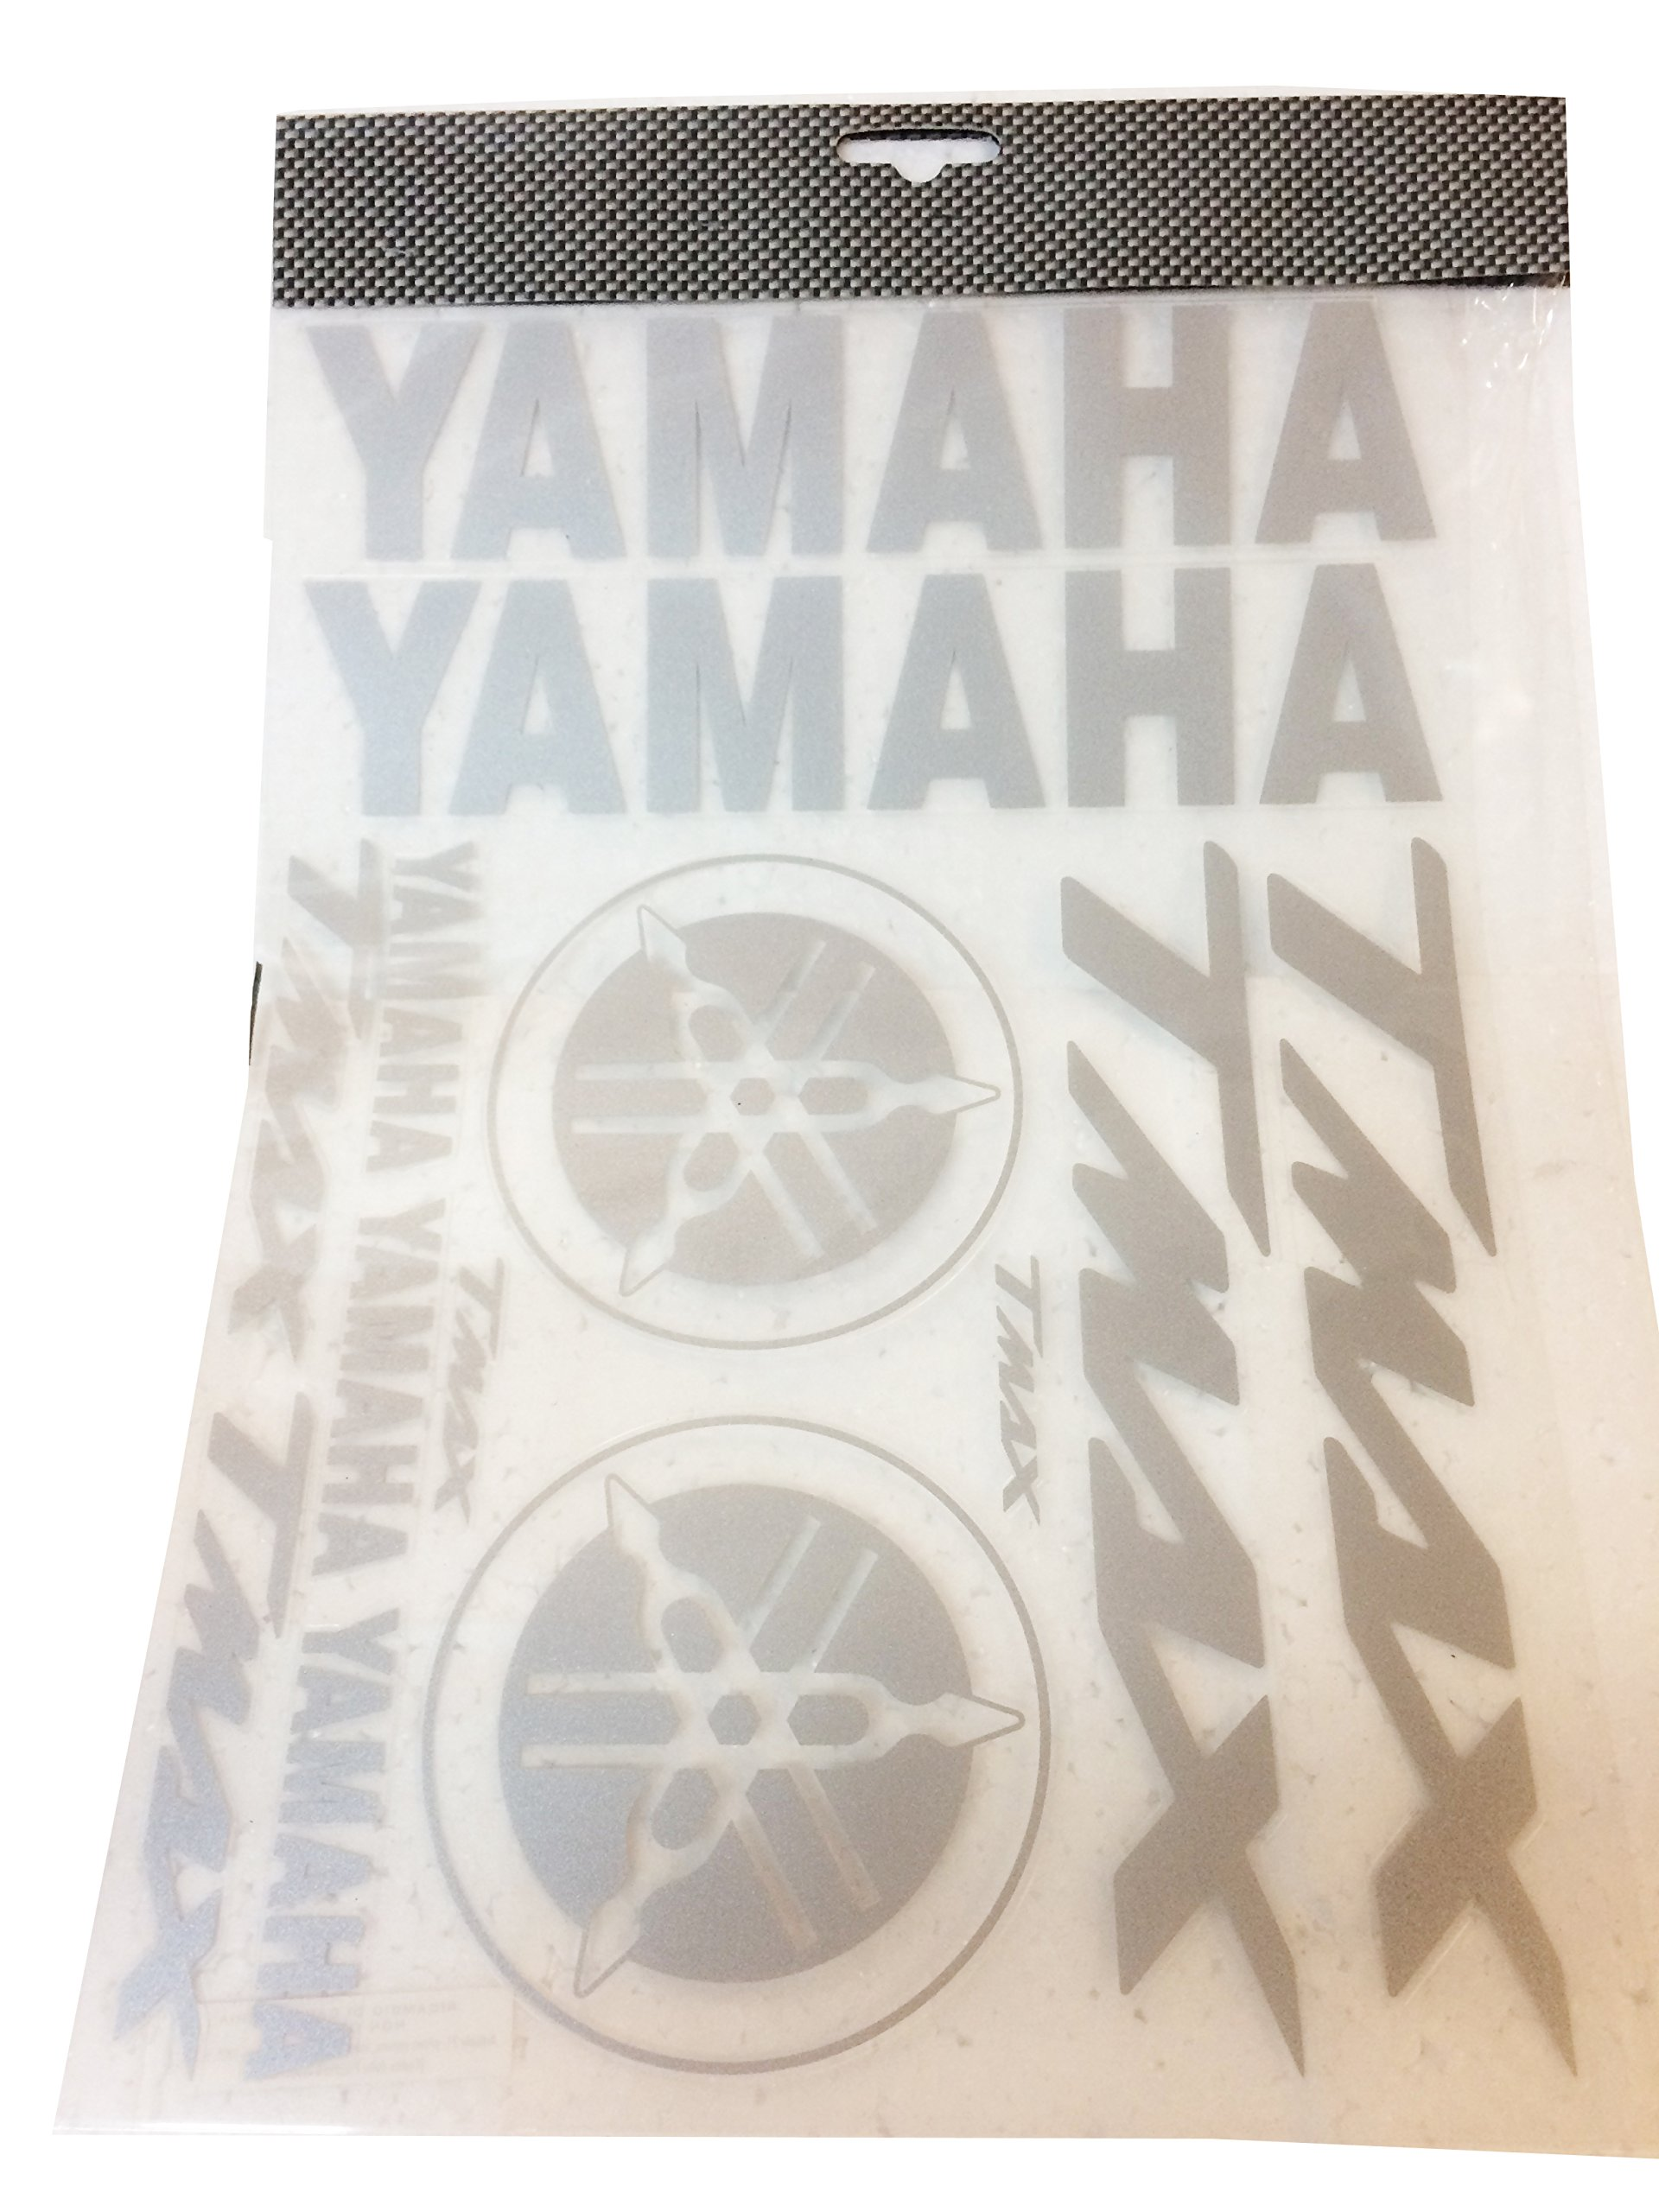 Kit Adhesivos Yamaha T-MAX precortados Transparentes